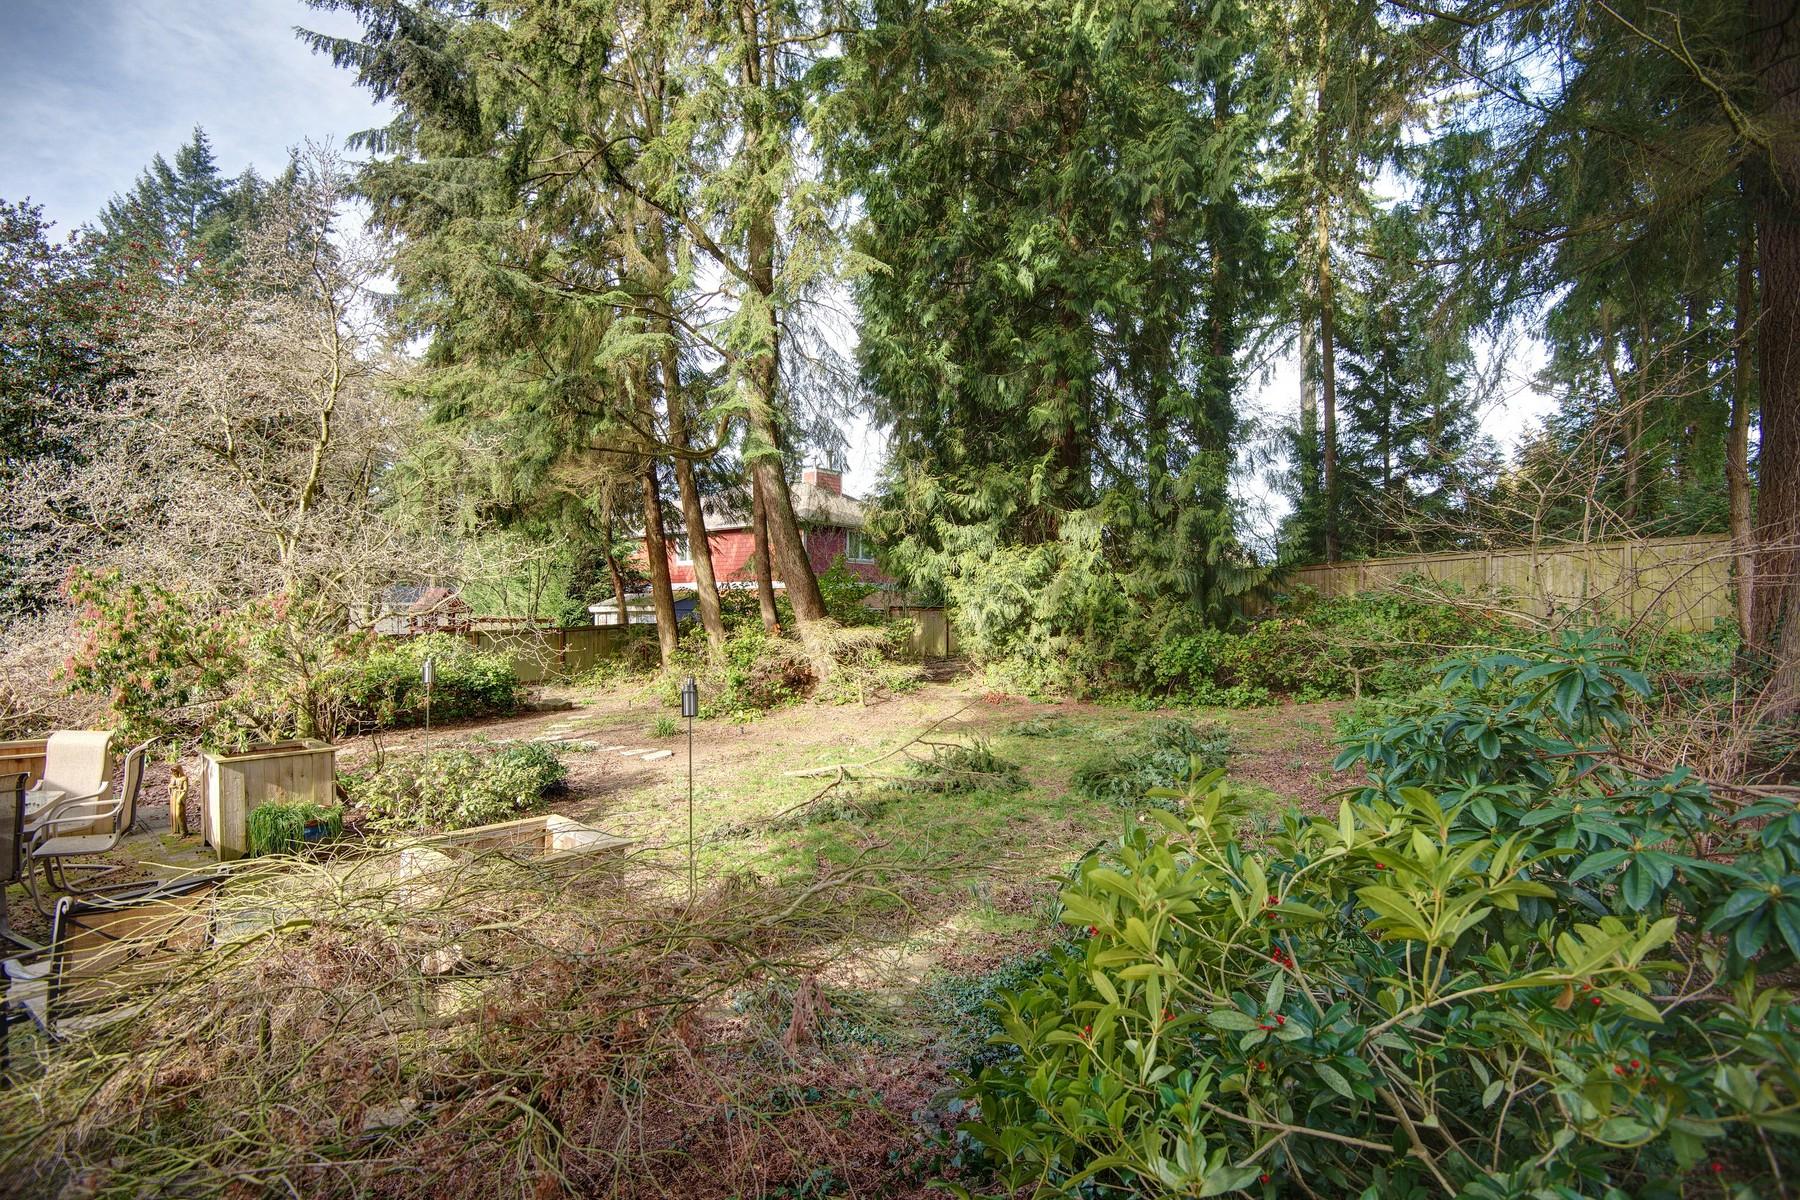 Additional photo for property listing at Traditional Rose Hill Home 12812 NE 73 St Kirkland, Washington 98033 United States